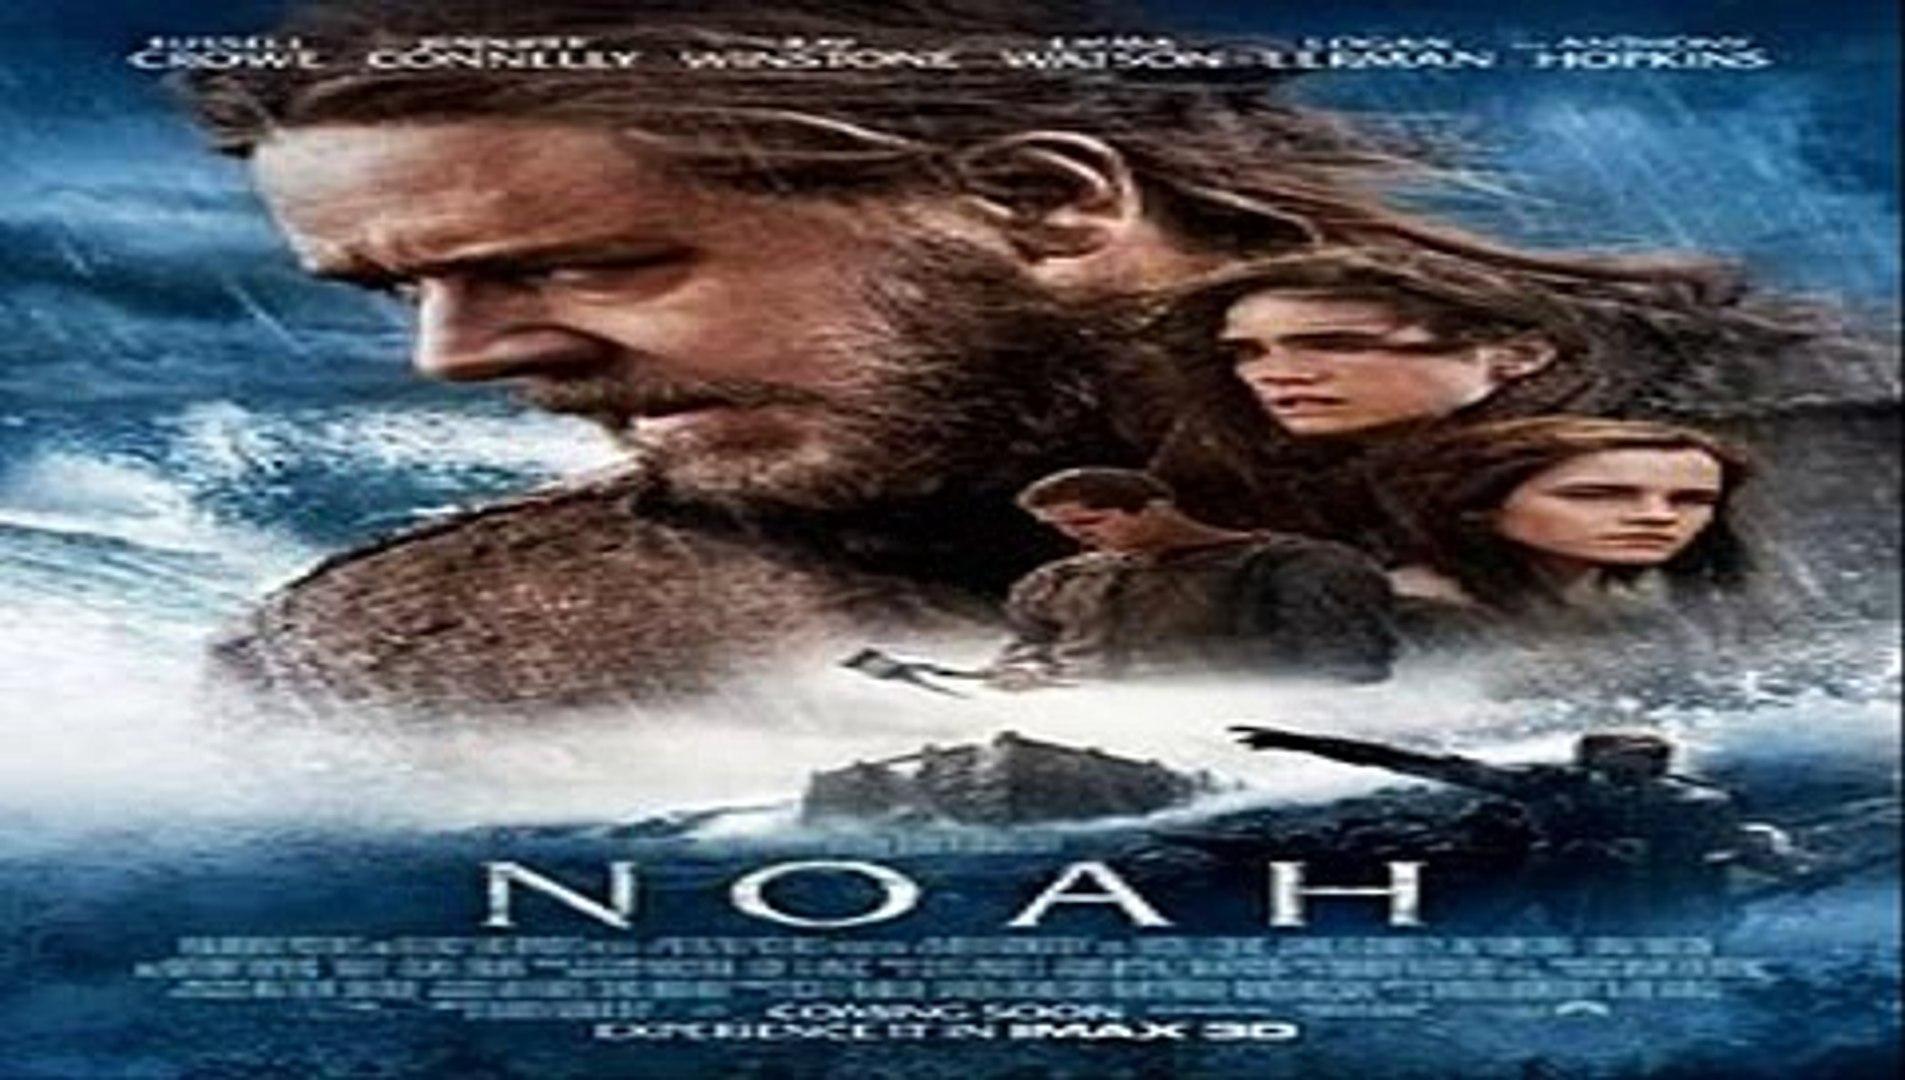 Noah 2014 Full Movie Streaming Video Dailymotion